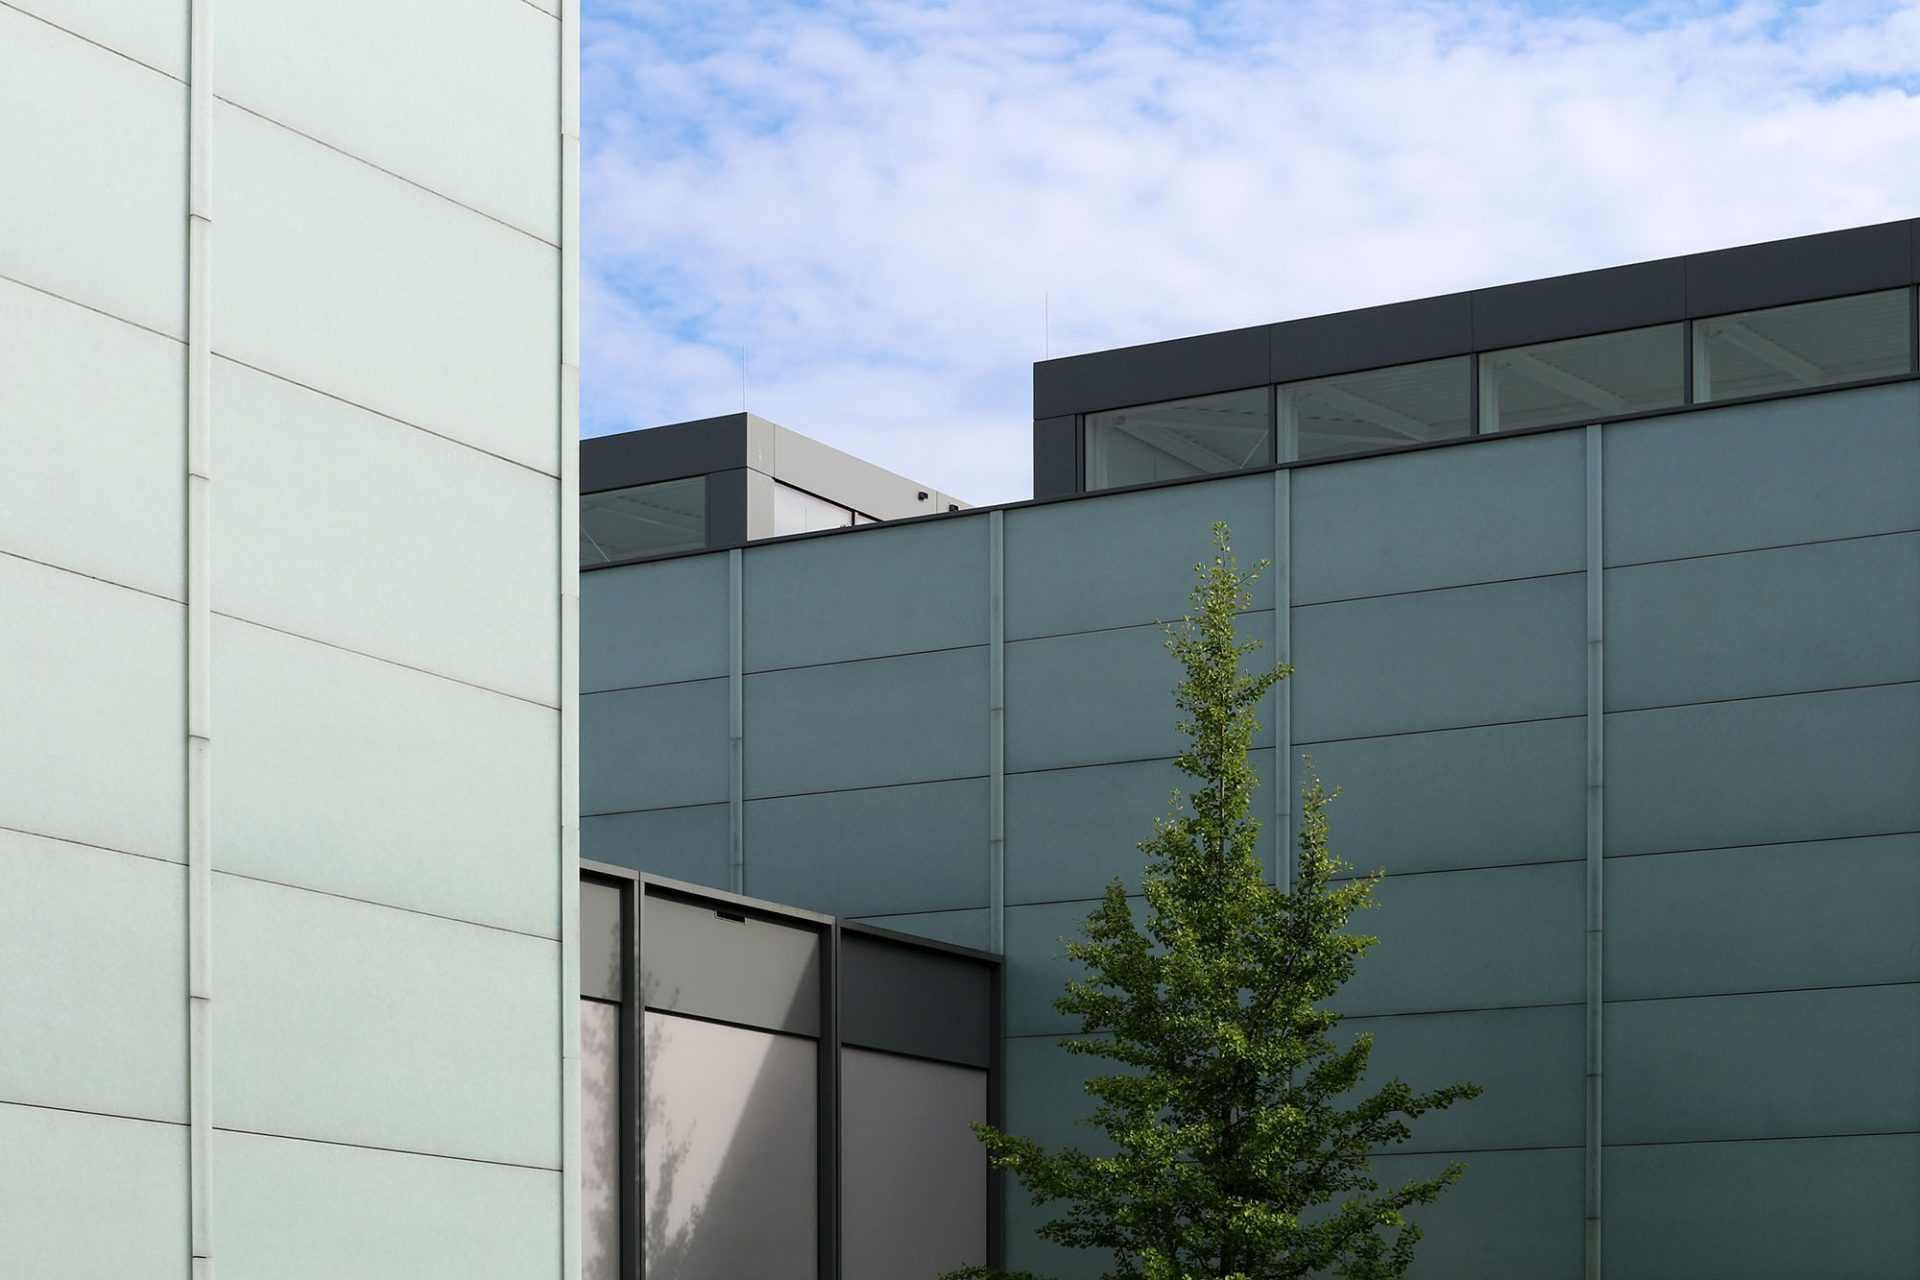 Museum Folkwang. Die Fassaden sind mit recycelten lichtgrünen Glaselementen bekleidet.